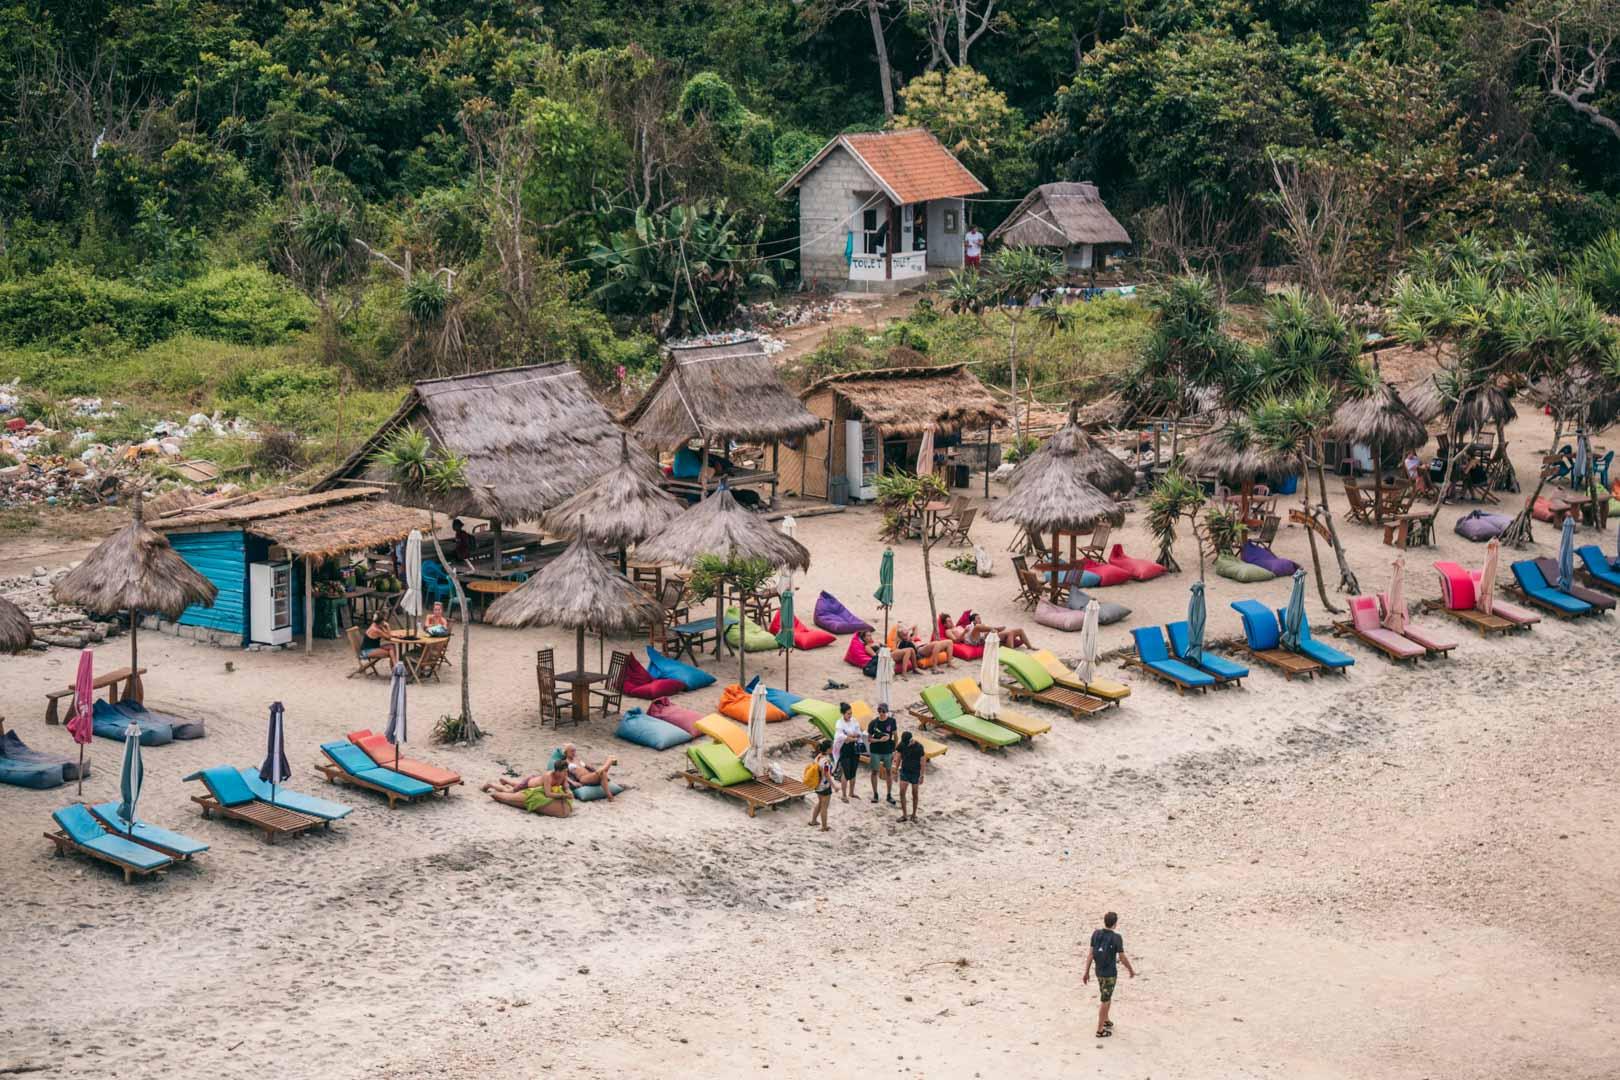 Atuh Beach sun loungers and warungs